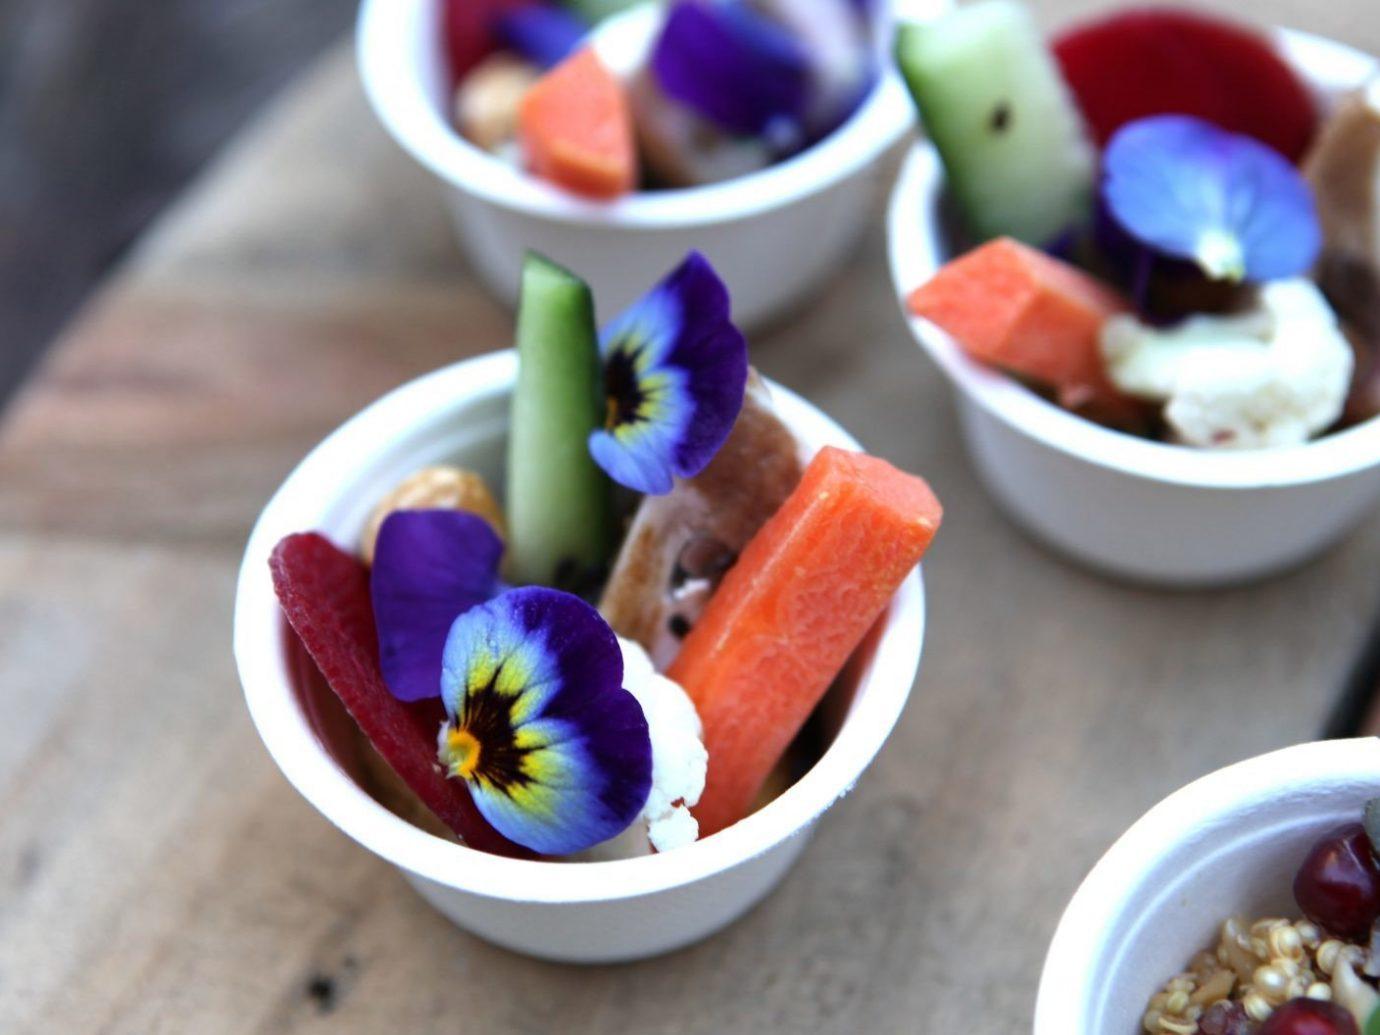 Trip Ideas food ground color bowl plate fruit meal produce flower lunch dessert dishware vegetable